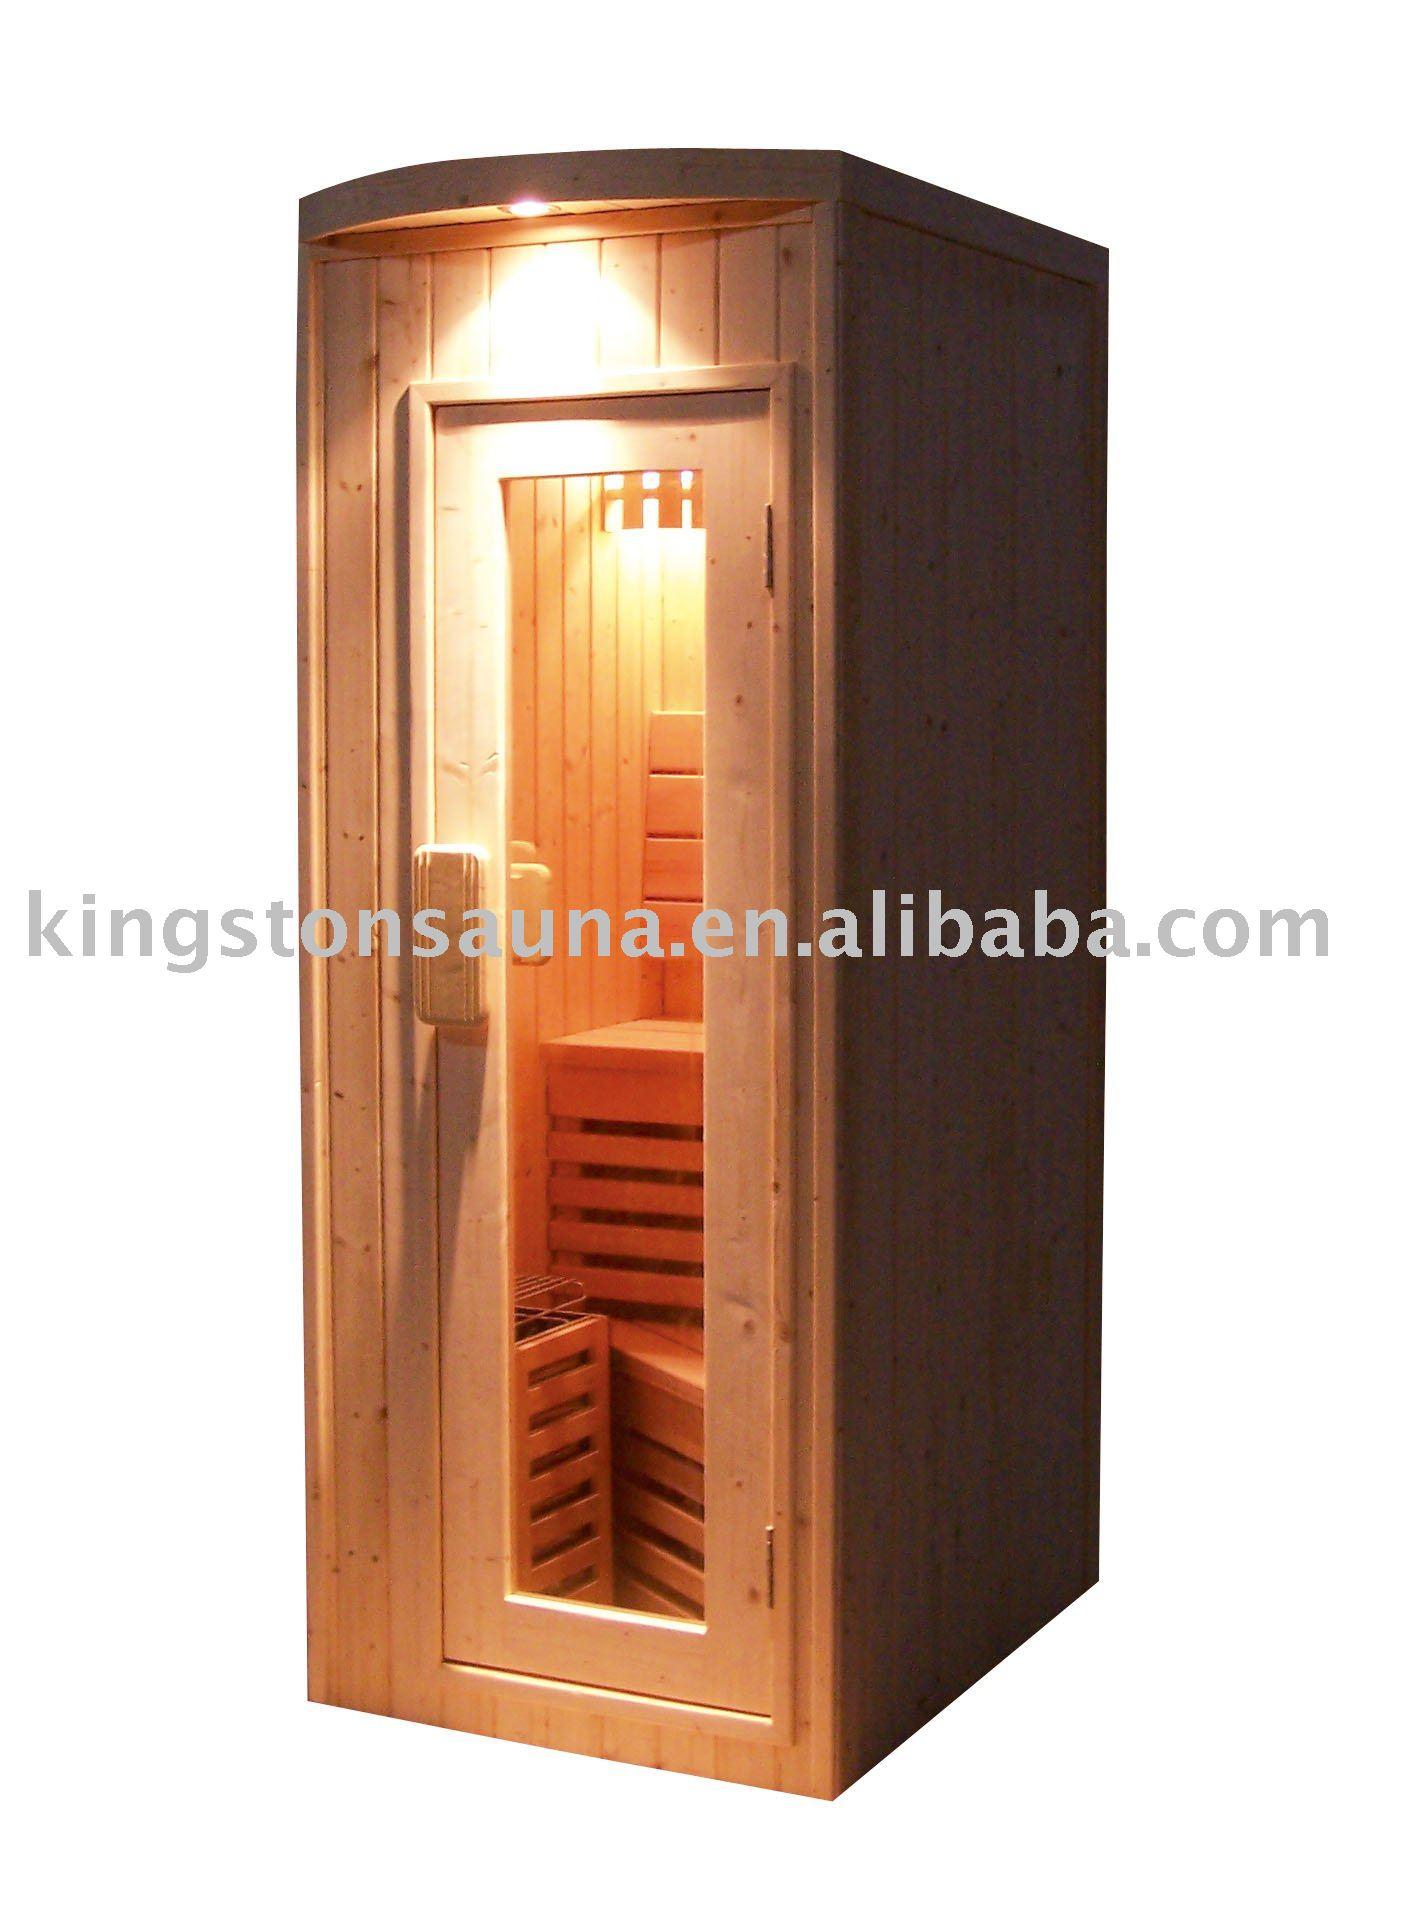 nico vapor seco tradicional sala de sauna cabine de sauna sauna casa